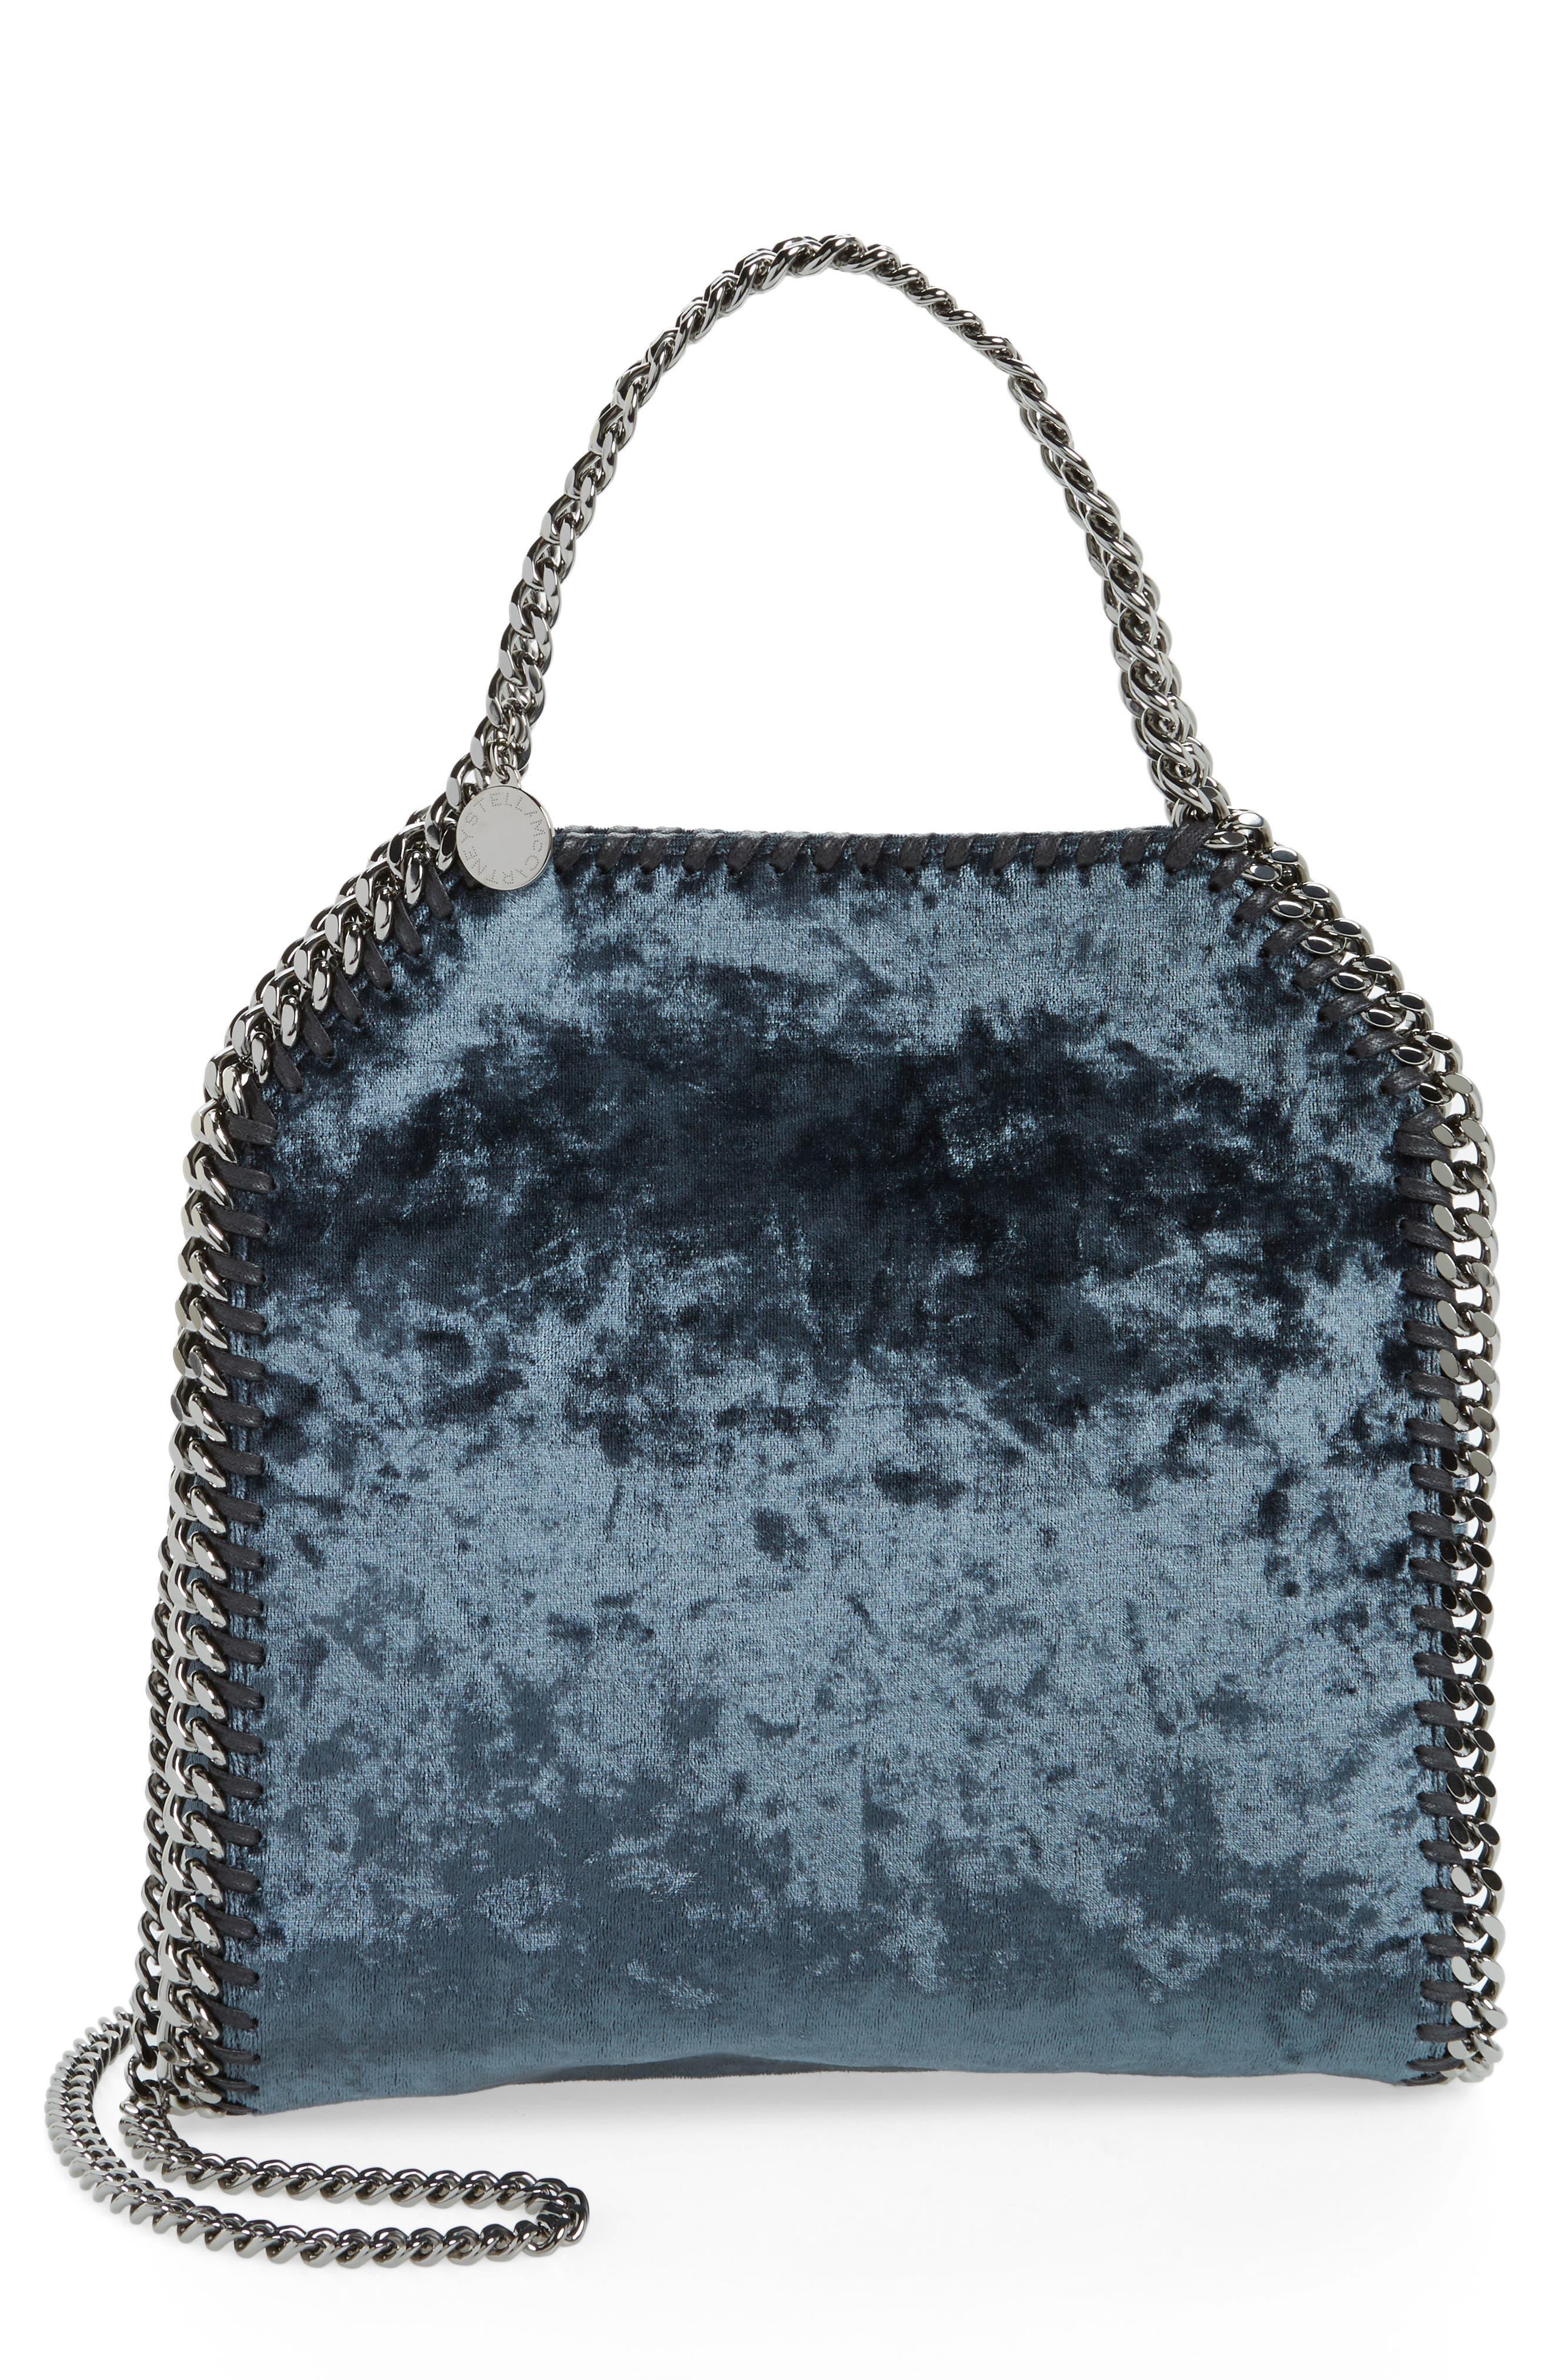 STELLA MCCARTNEY Mini Falabella Crushed Velvet Bag